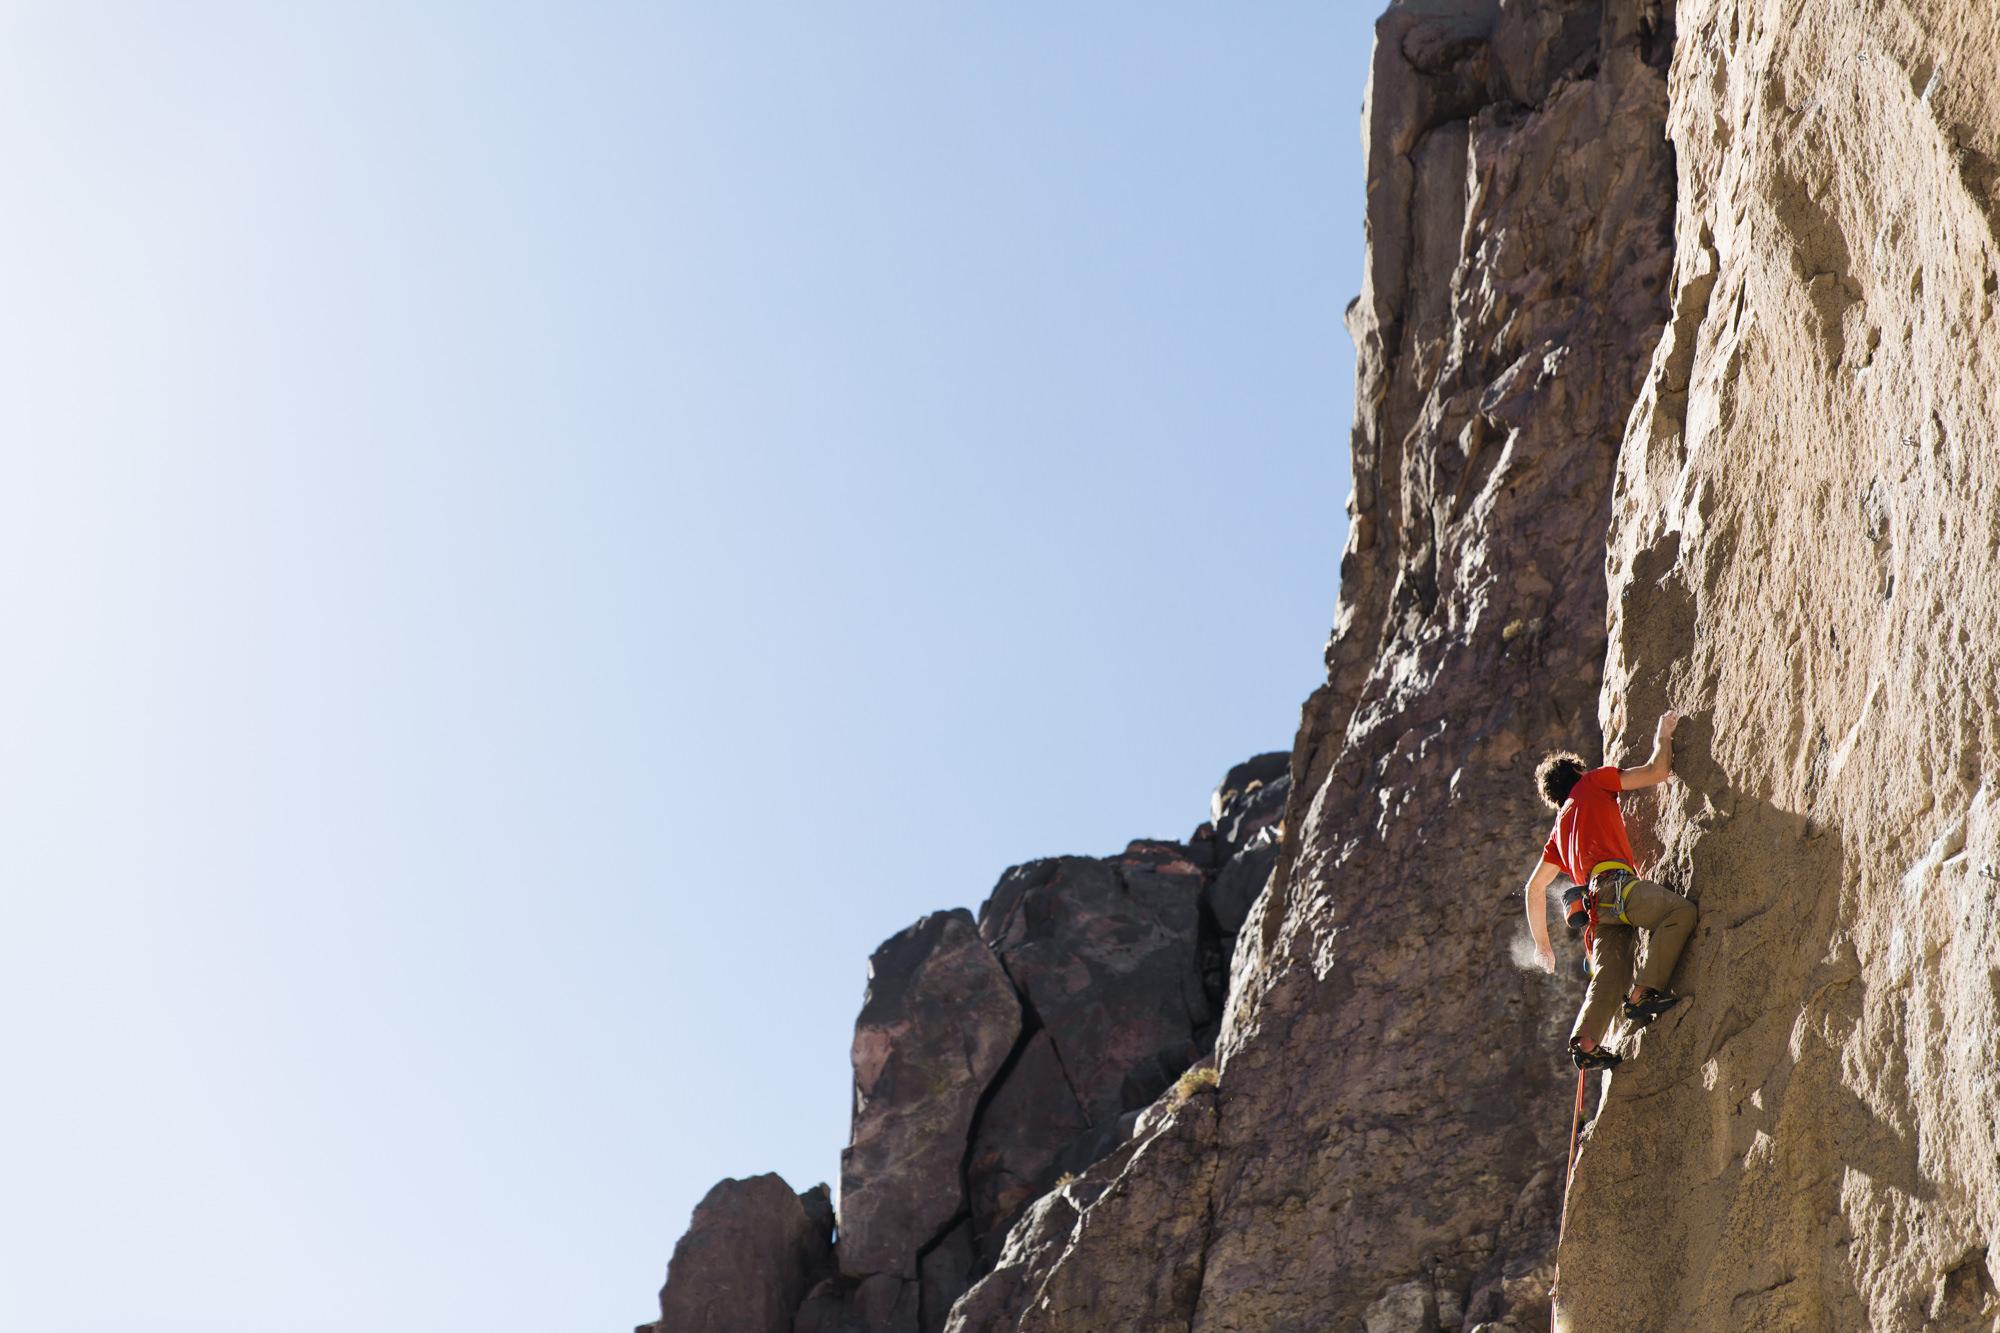 rock-climbing-photography-10.jpg